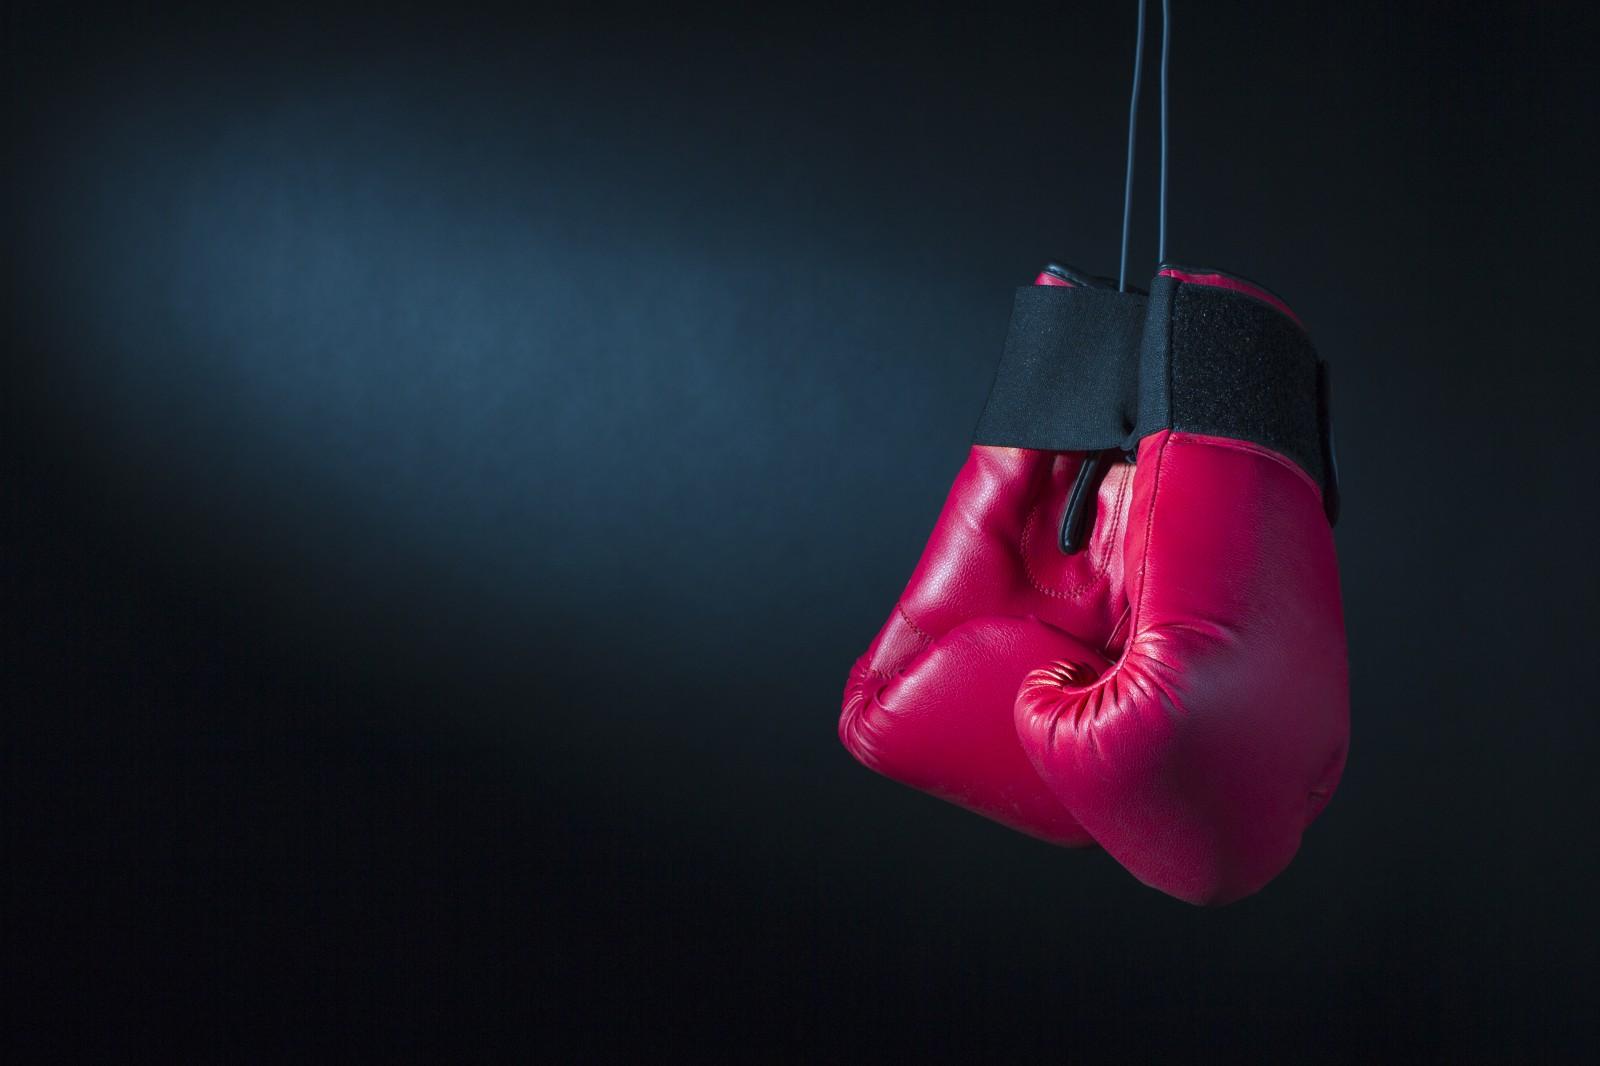 74] Kickboxing Wallpaper on WallpaperSafari 1600x1066